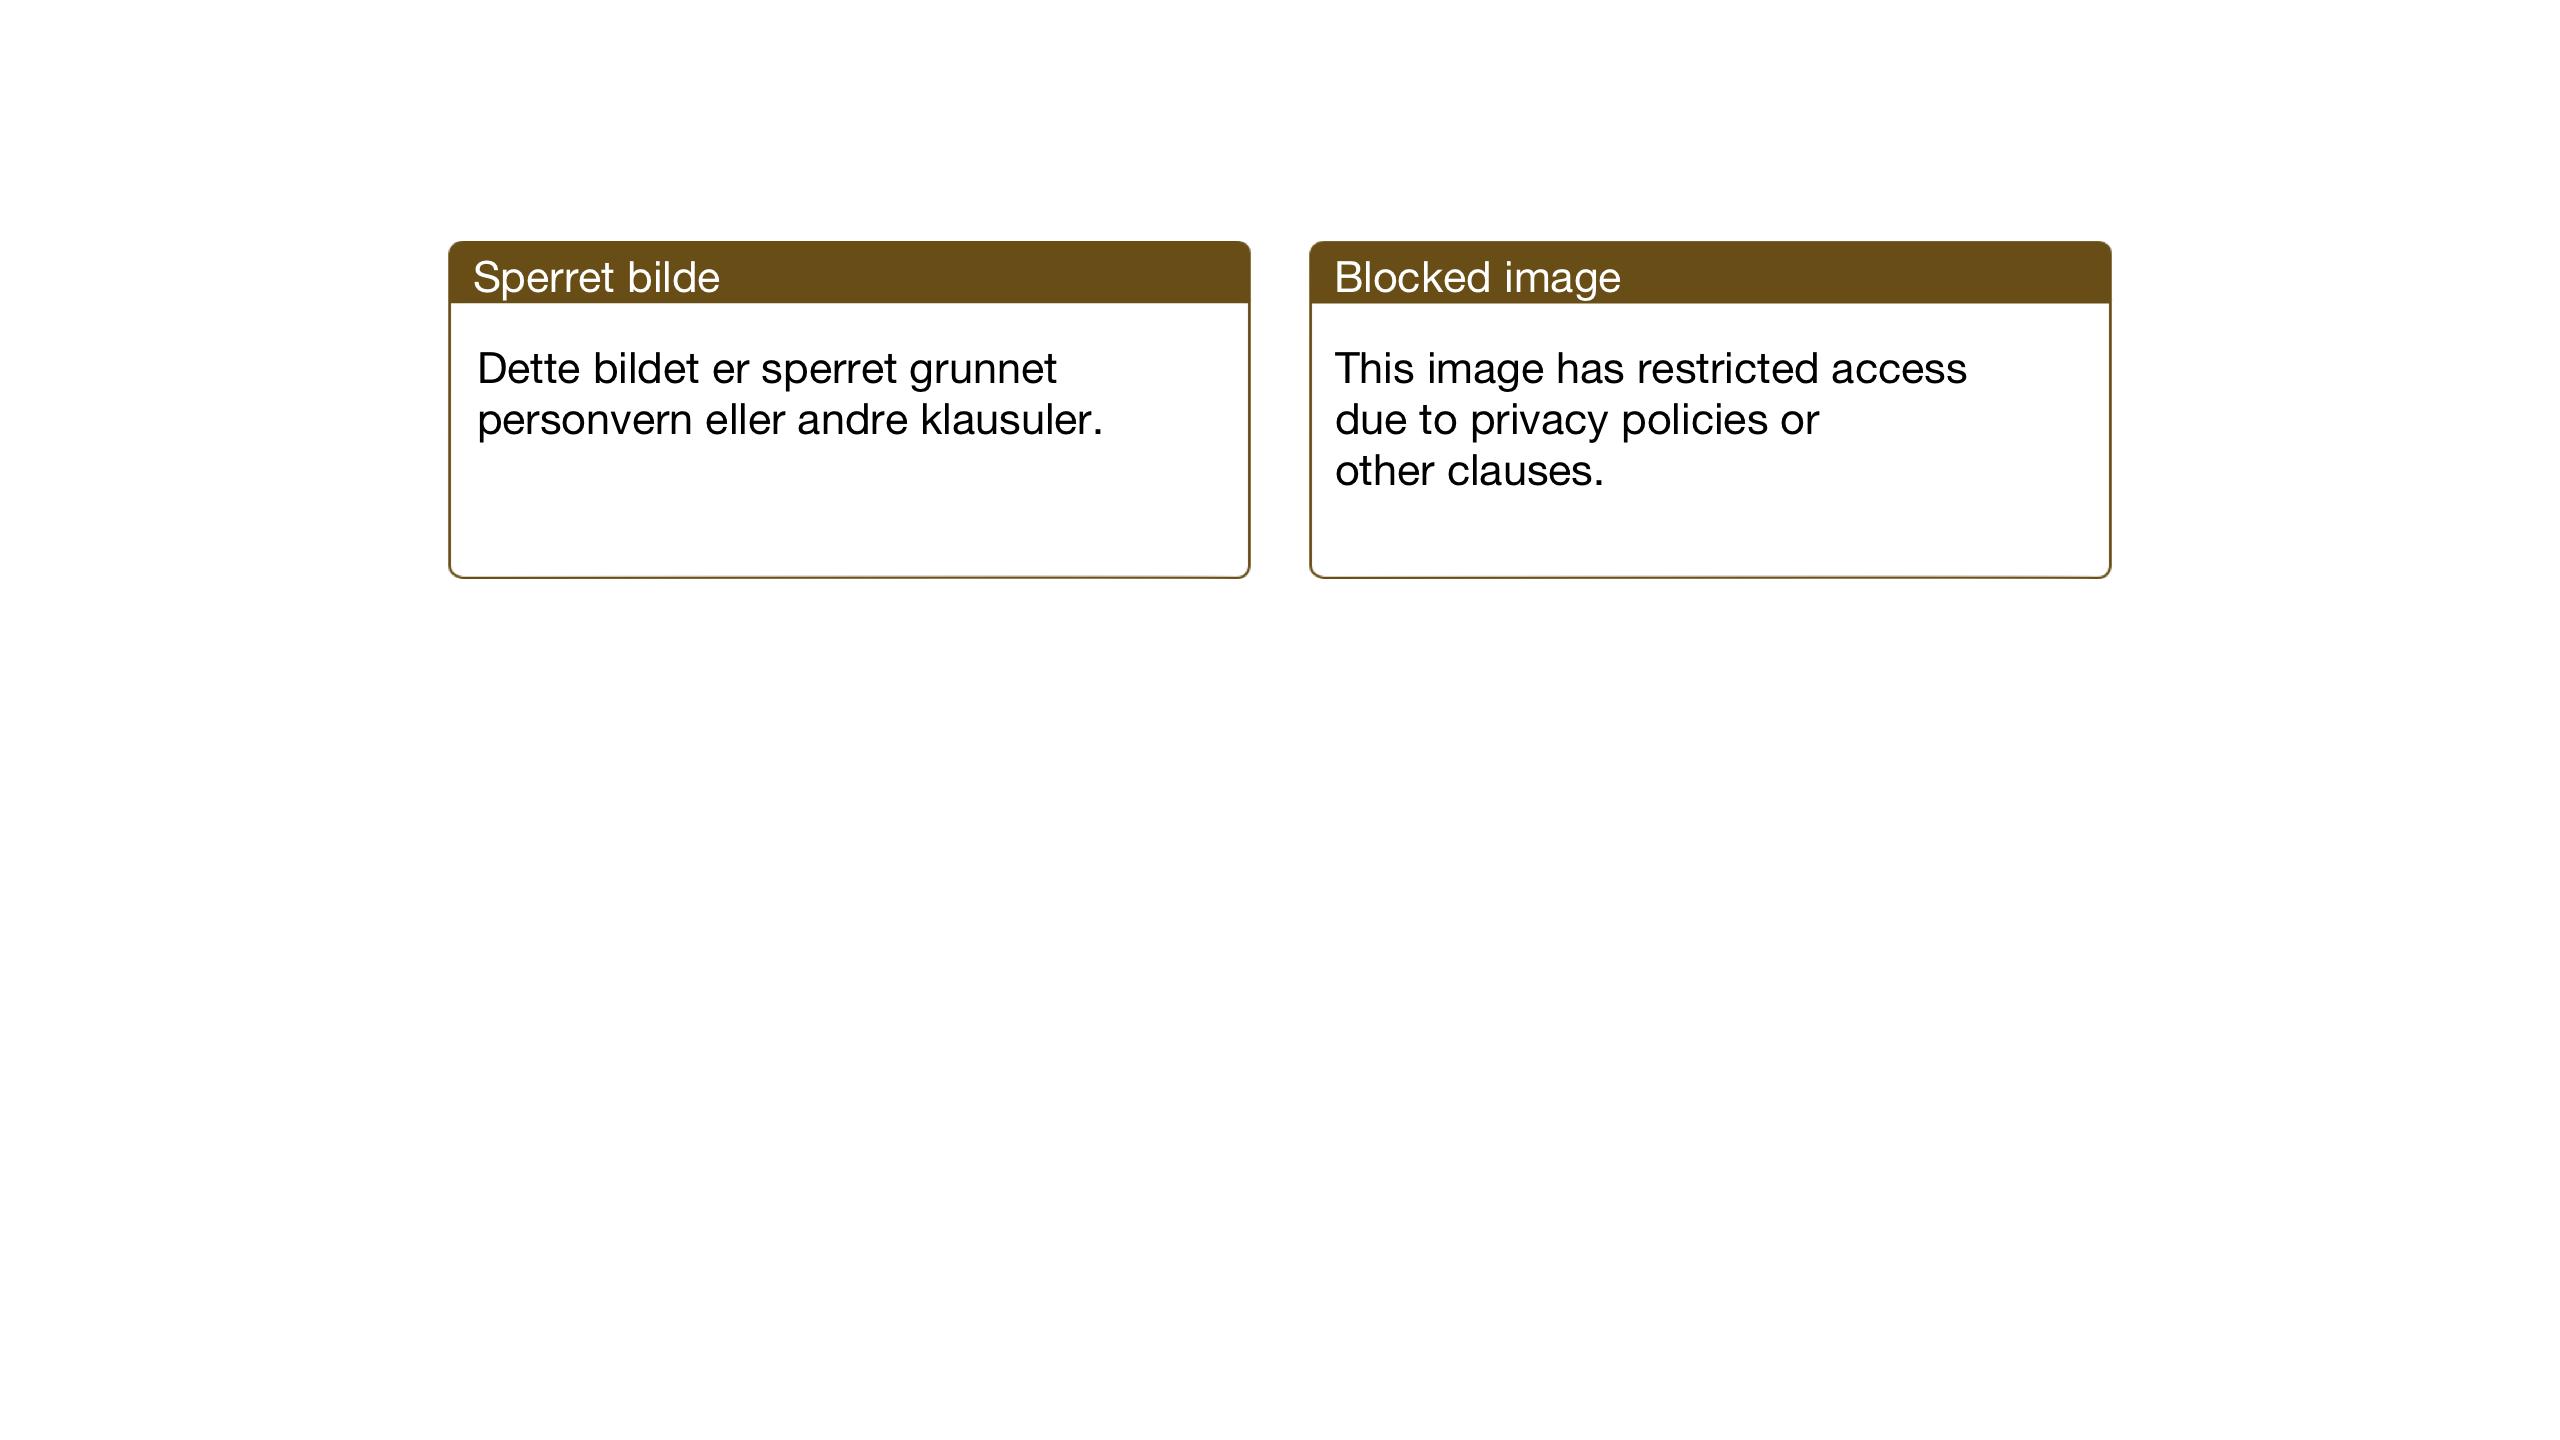 SAT, Ministerialprotokoller, klokkerbøker og fødselsregistre - Nordland, 847/L0680: Klokkerbok nr. 847C08, 1930-1947, s. 66